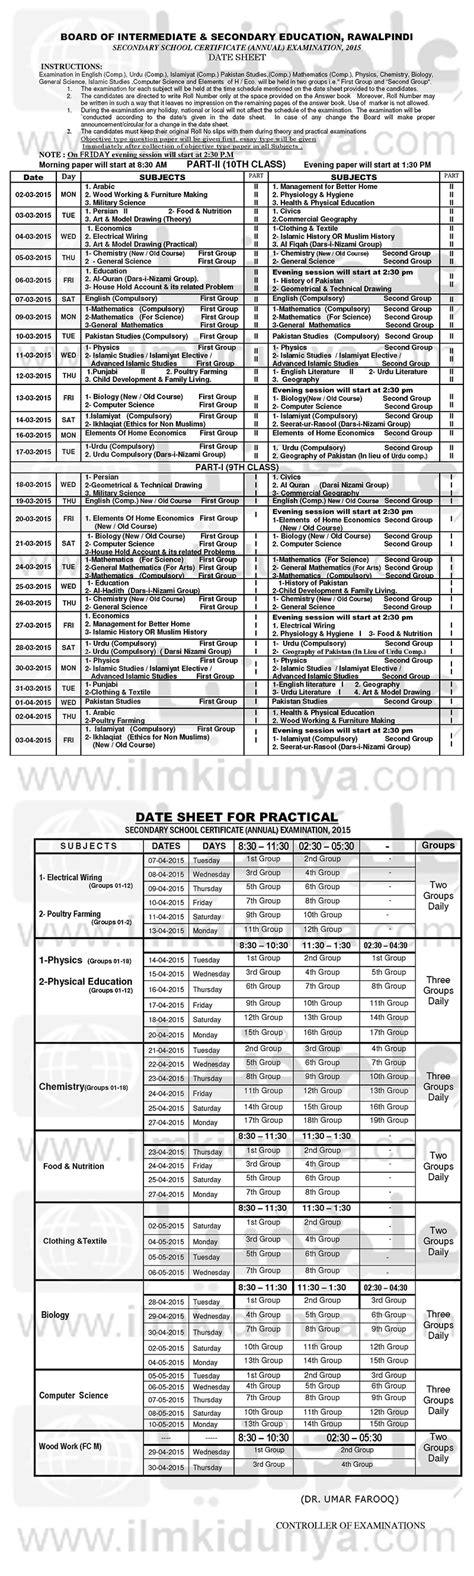 paper pattern 1st year rawalpindi board bise rawalpindi board matric inter date sheets 2018